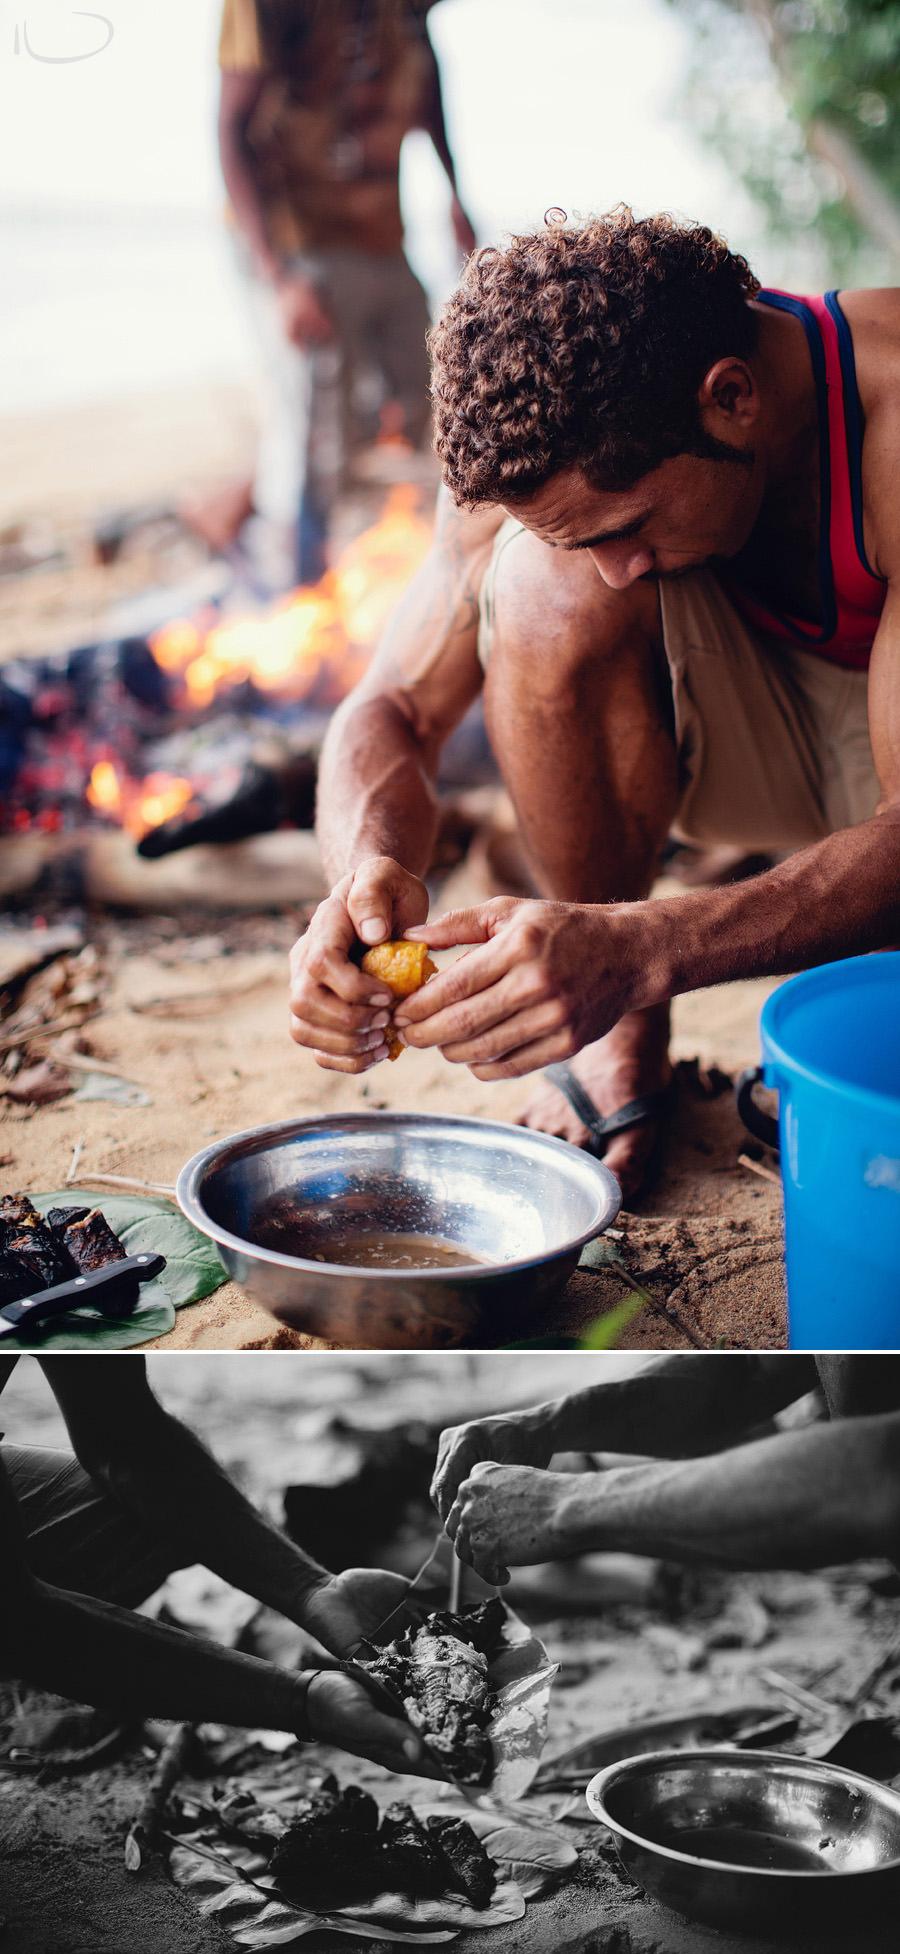 Fiji Travel Photography: Beach bonfire